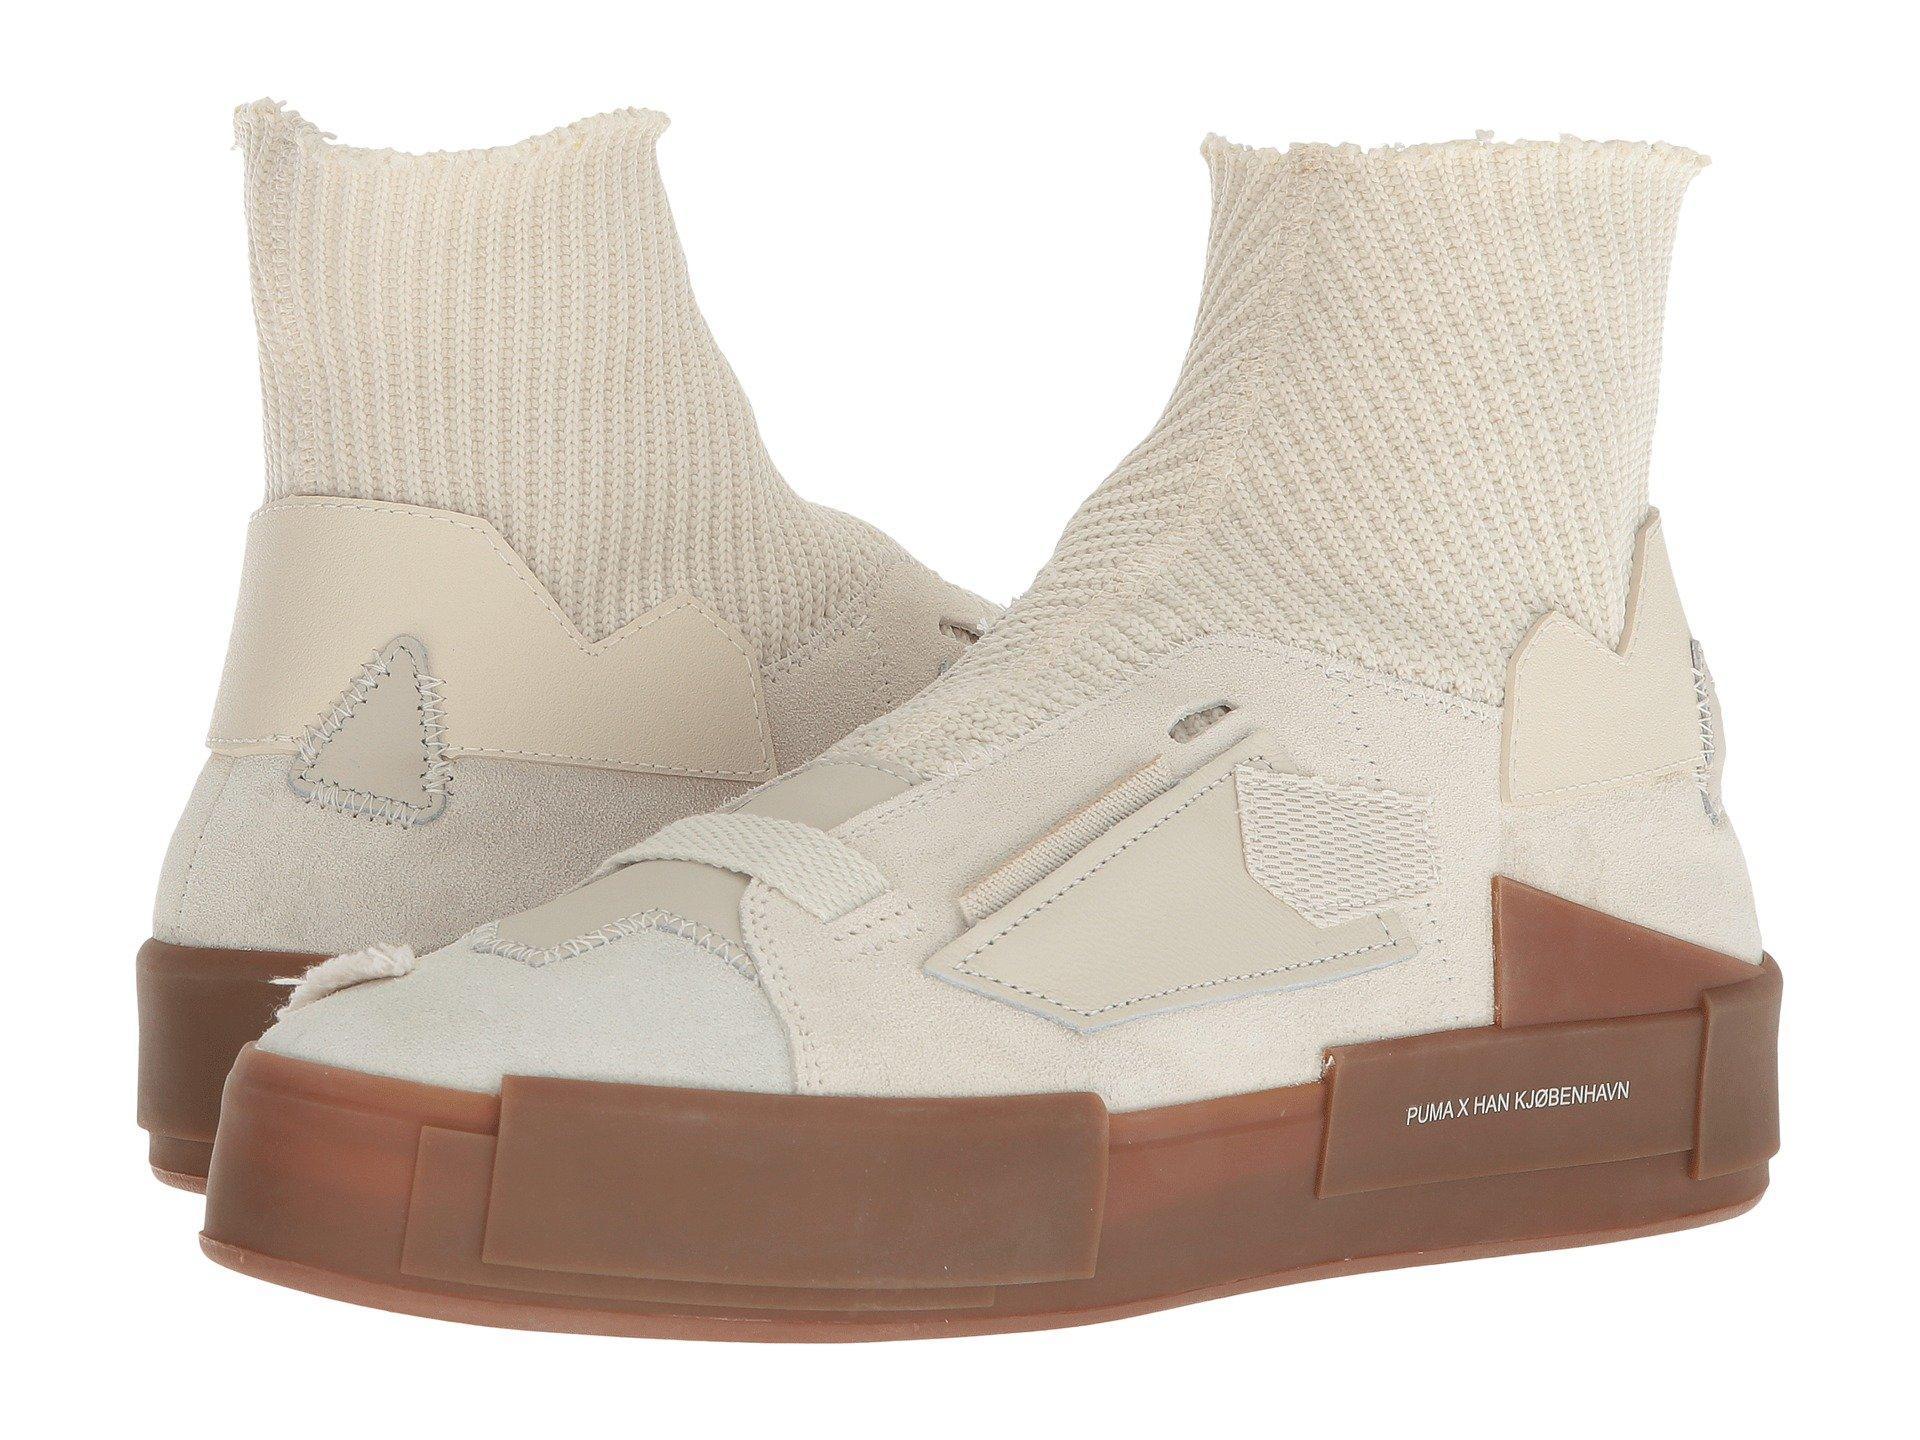 0db5e1794d0129 Lyst - PUMA X Han Kjøbenhavn Court Platform Sneaker for Men - Save 58%